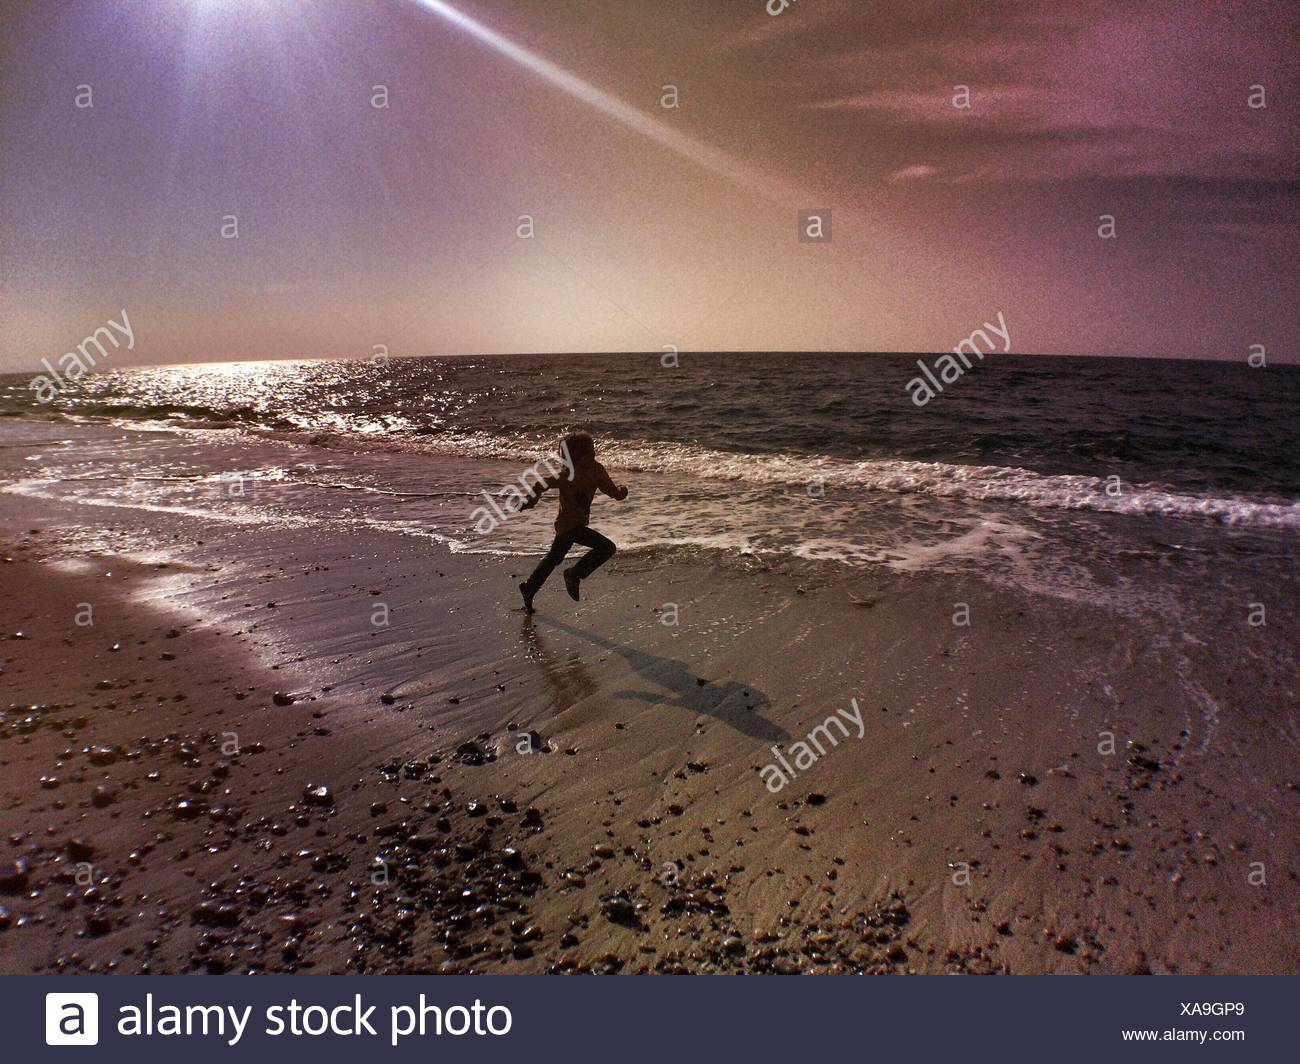 Boy Running On Beach contre ciel lors de journée ensoleillée Photo Stock